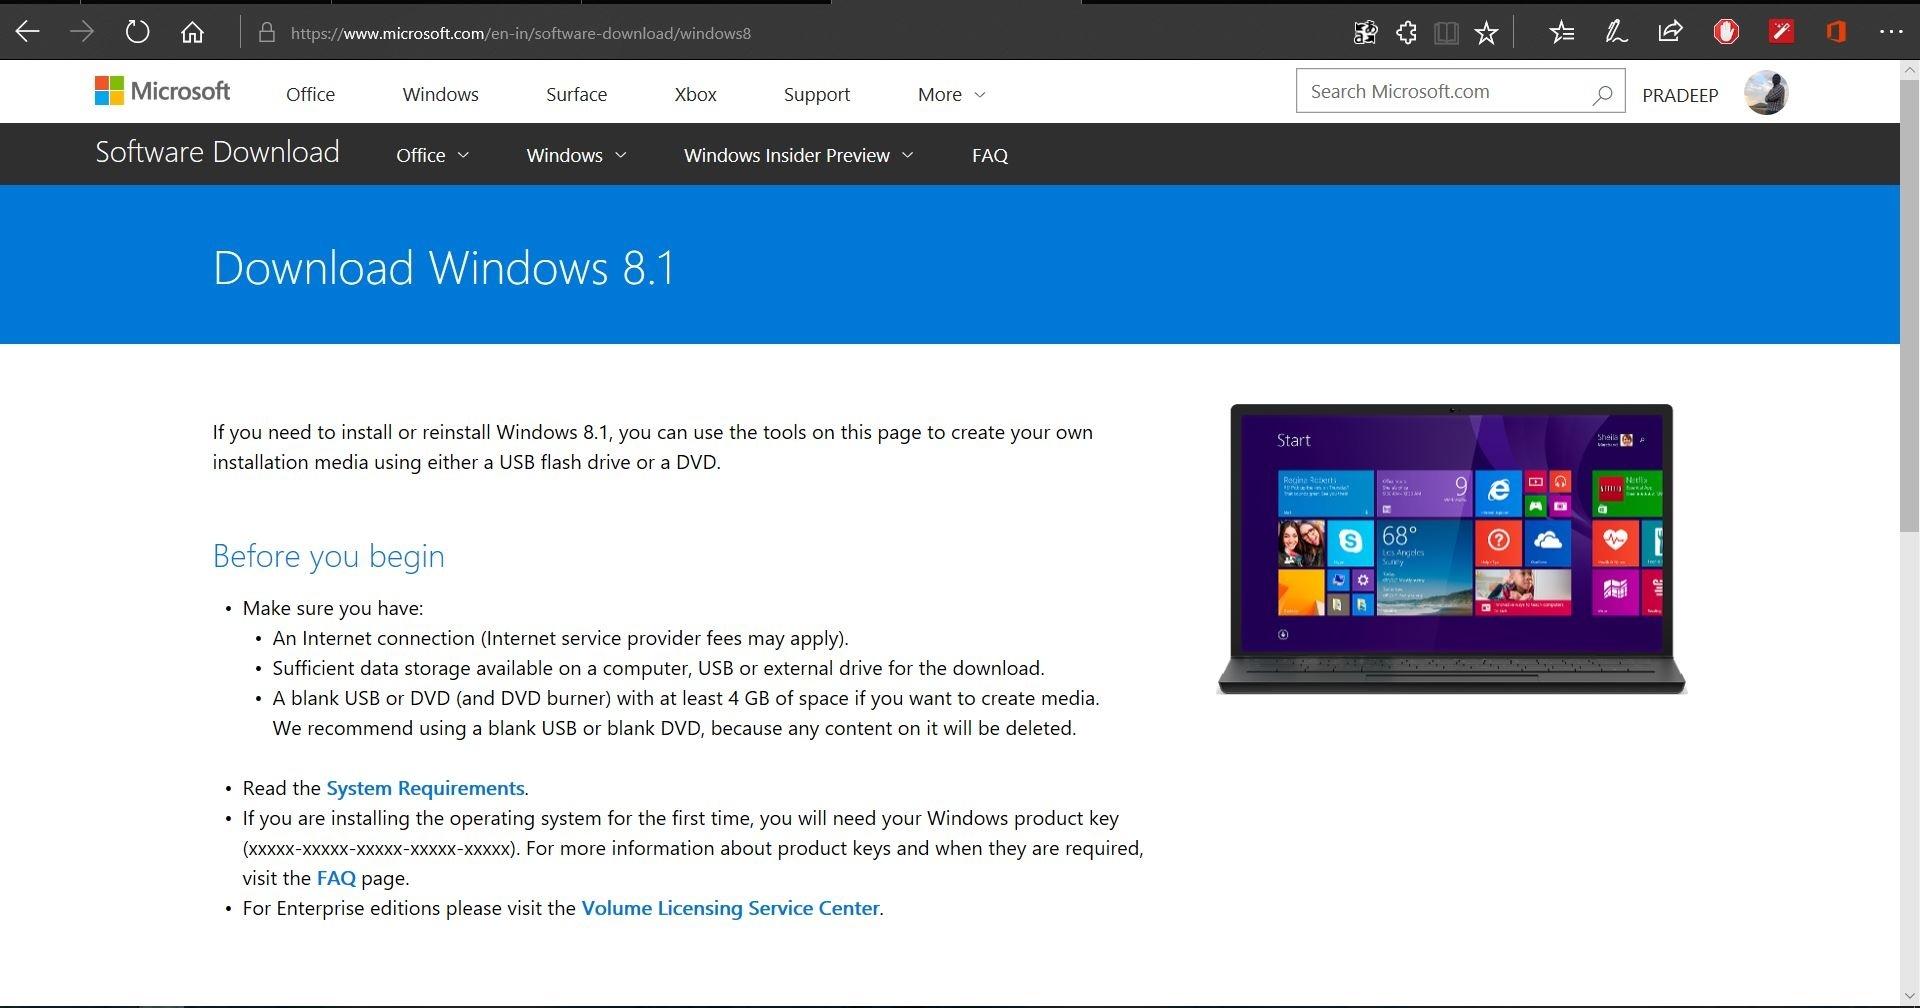 Why does Chrome always crash on my Windows 8 PC? - Quora